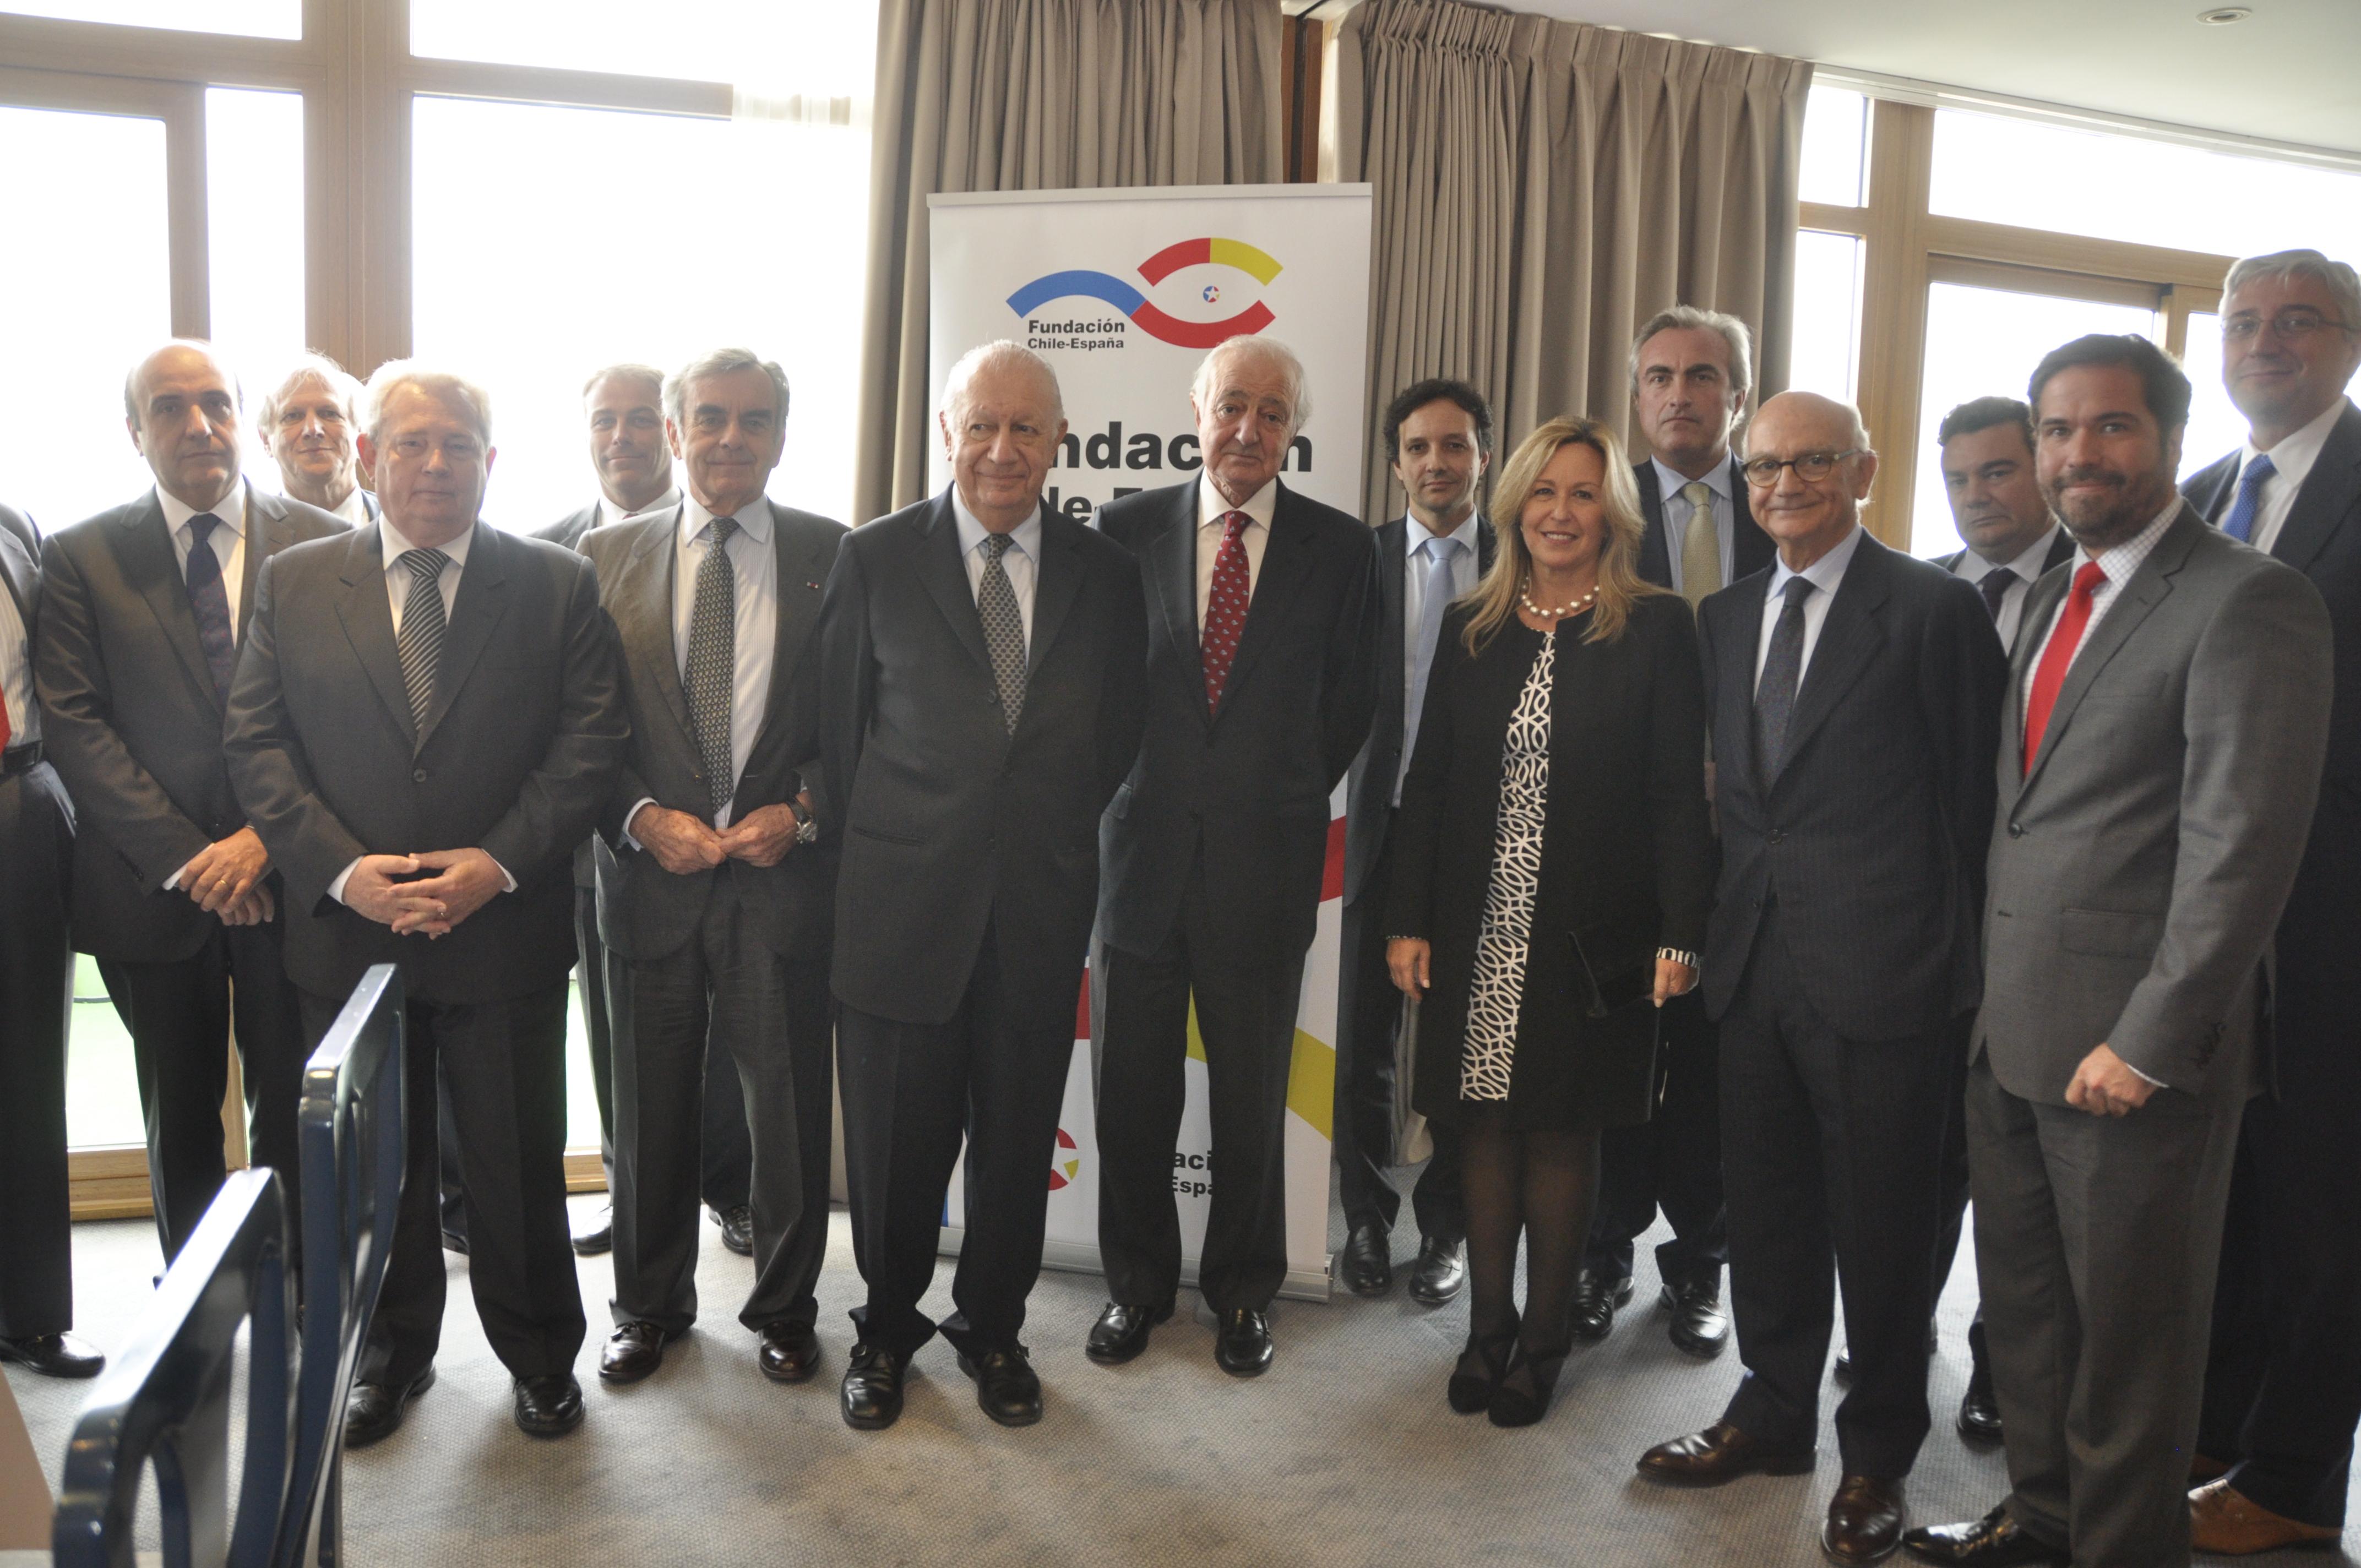 Almuerzo Coloquio con el presidente de Chile, Ricardo Lagos